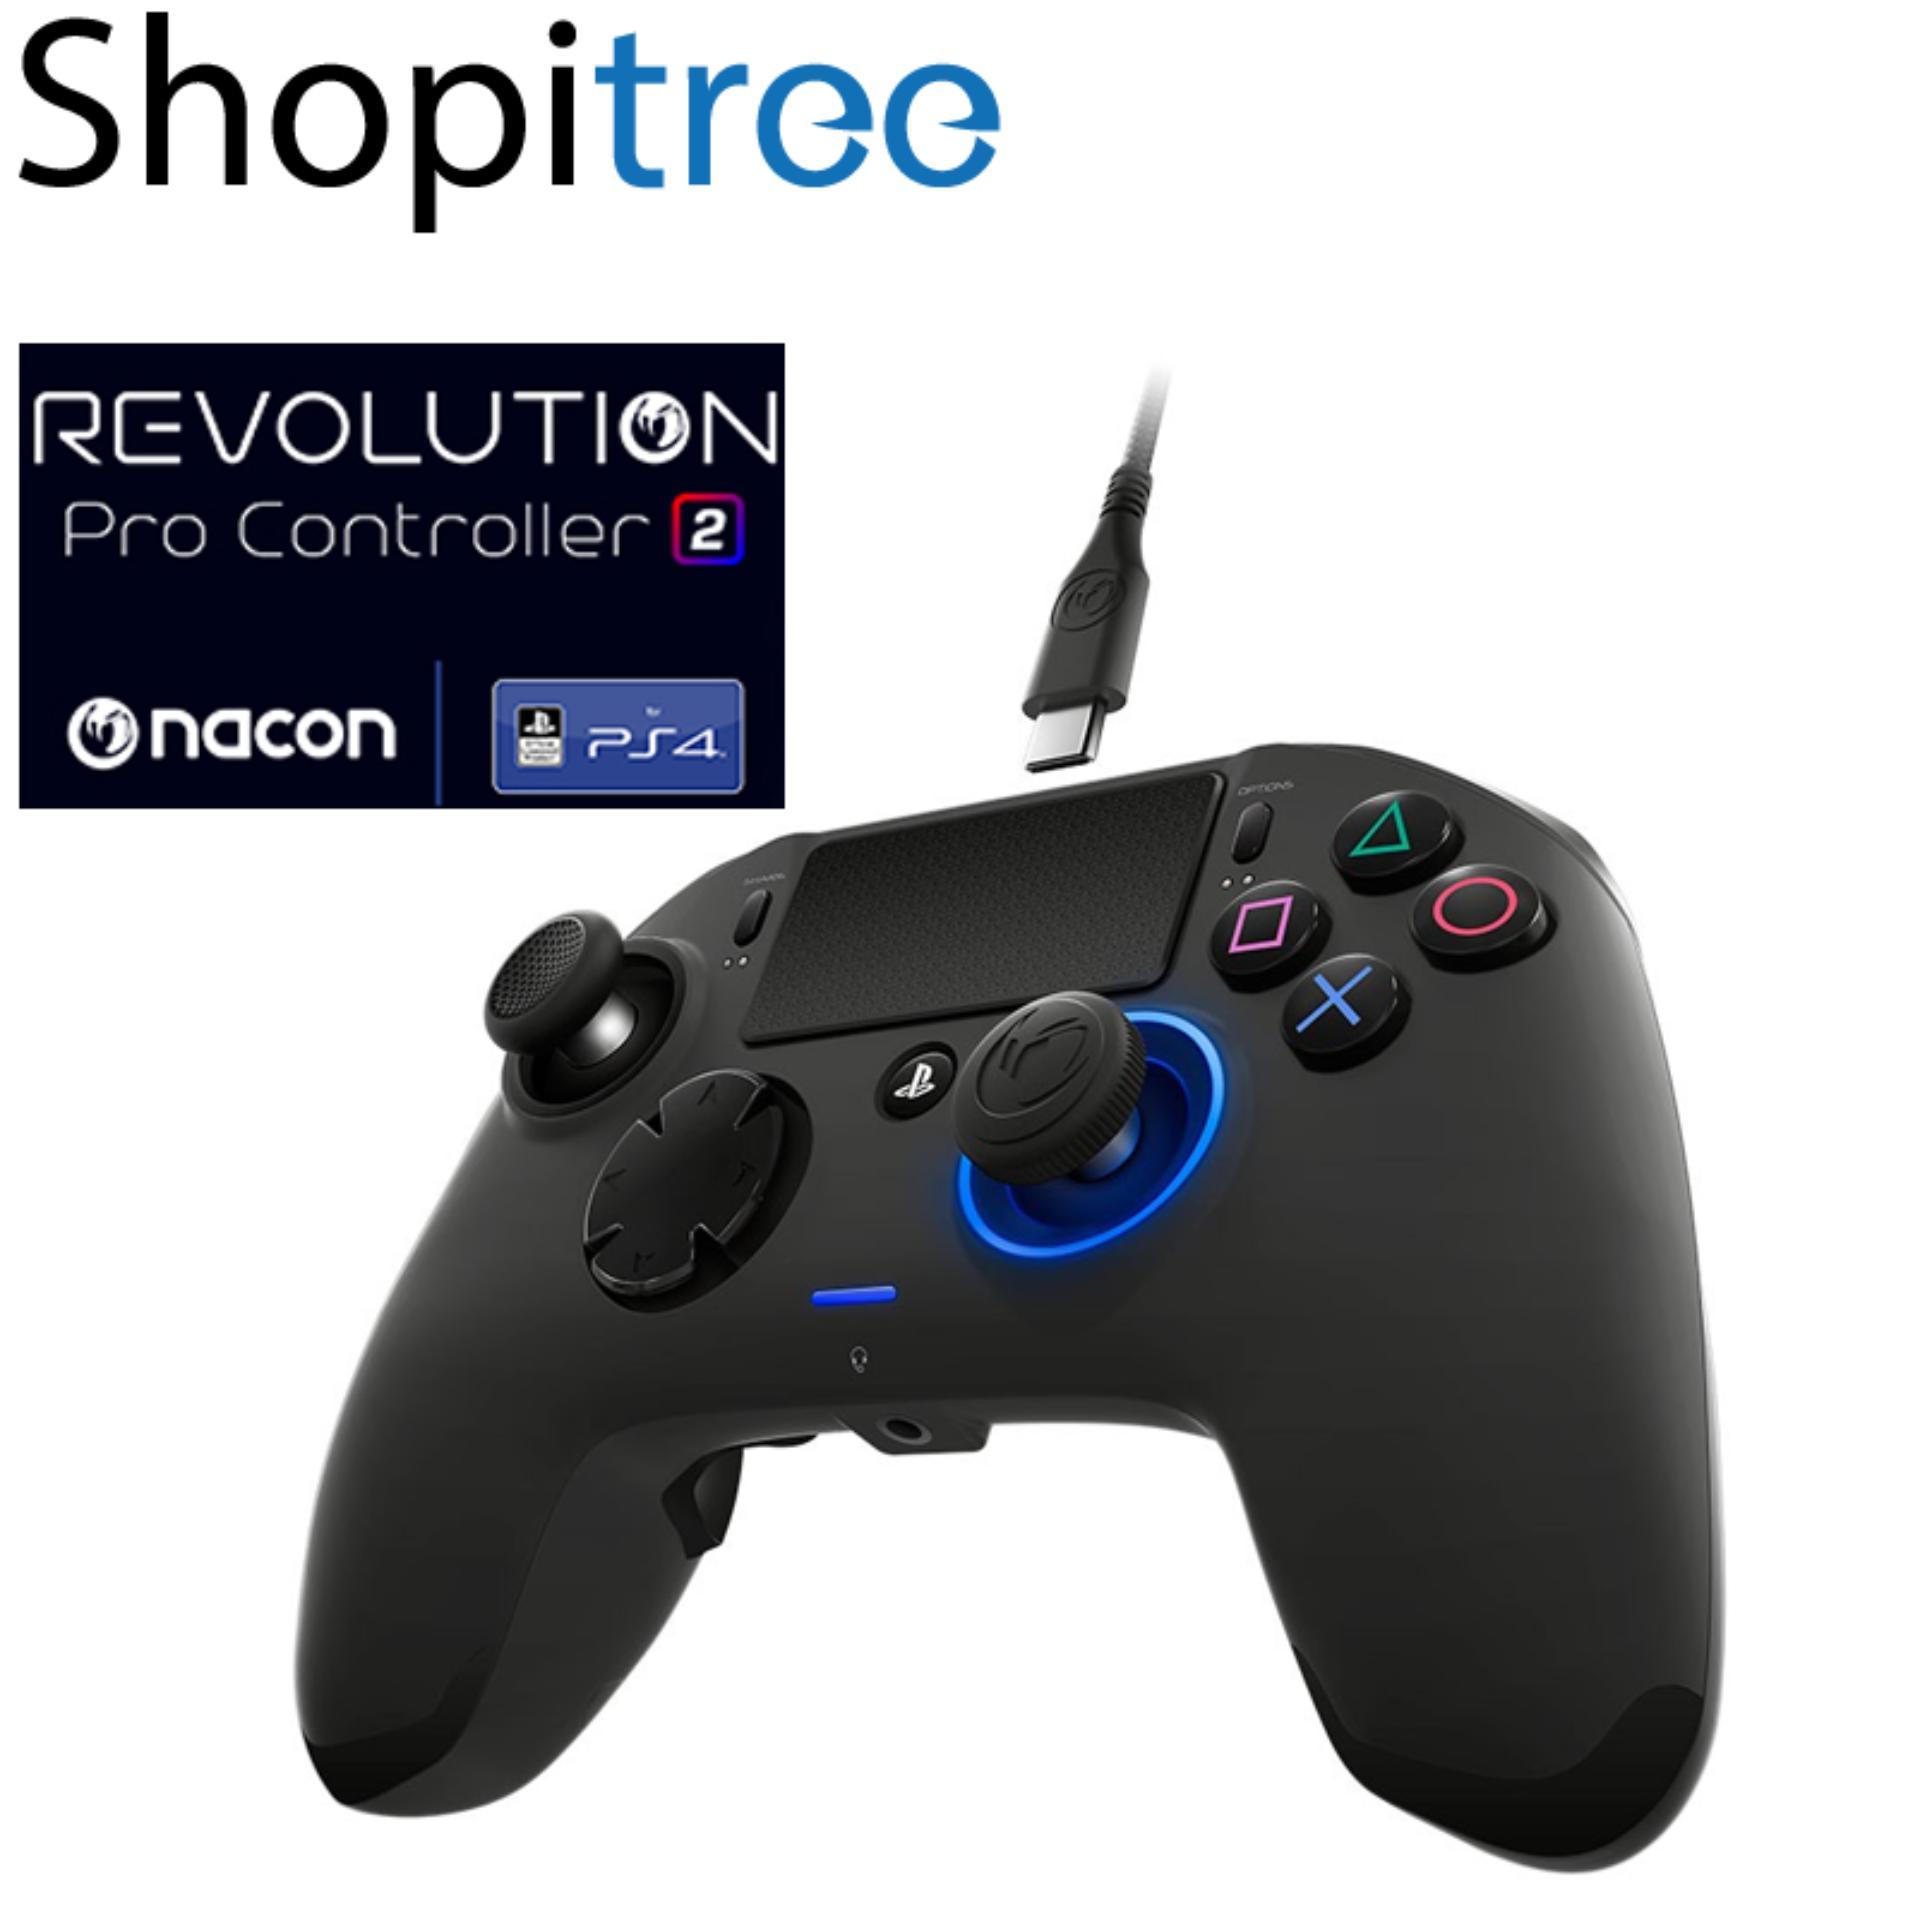 Nacon Revolution Pro Controller 2 for PS4 – Black